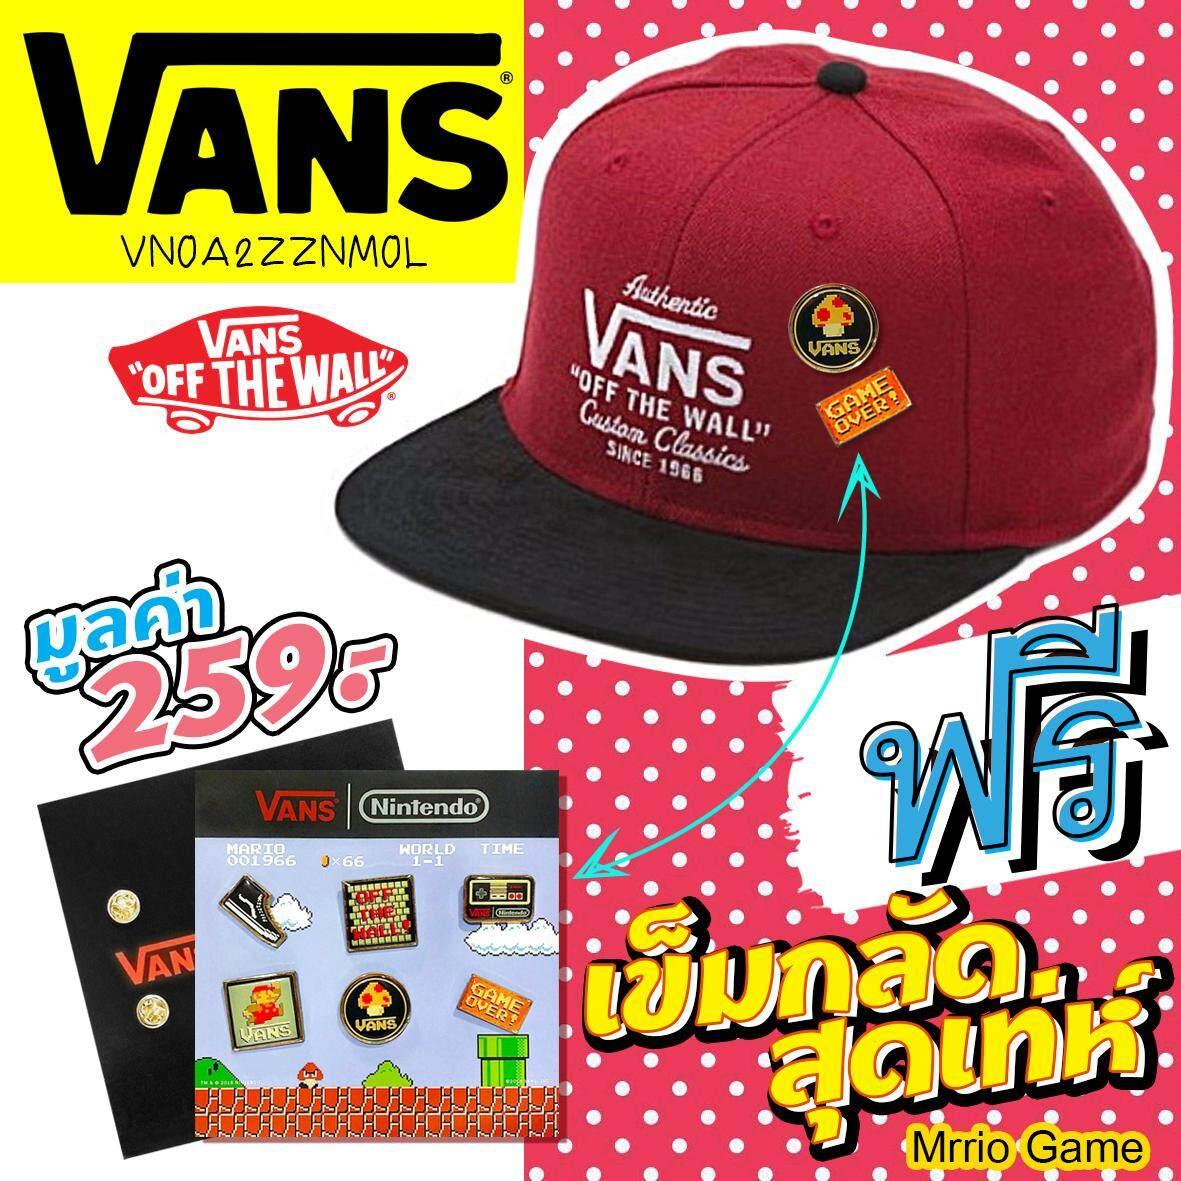 b28a61b6e04 Vans หมวก แวน M Cap Authentic Dress VN0A2ZZNM0L R (1300) แถม เข็มกลัด Vans  Nintendo